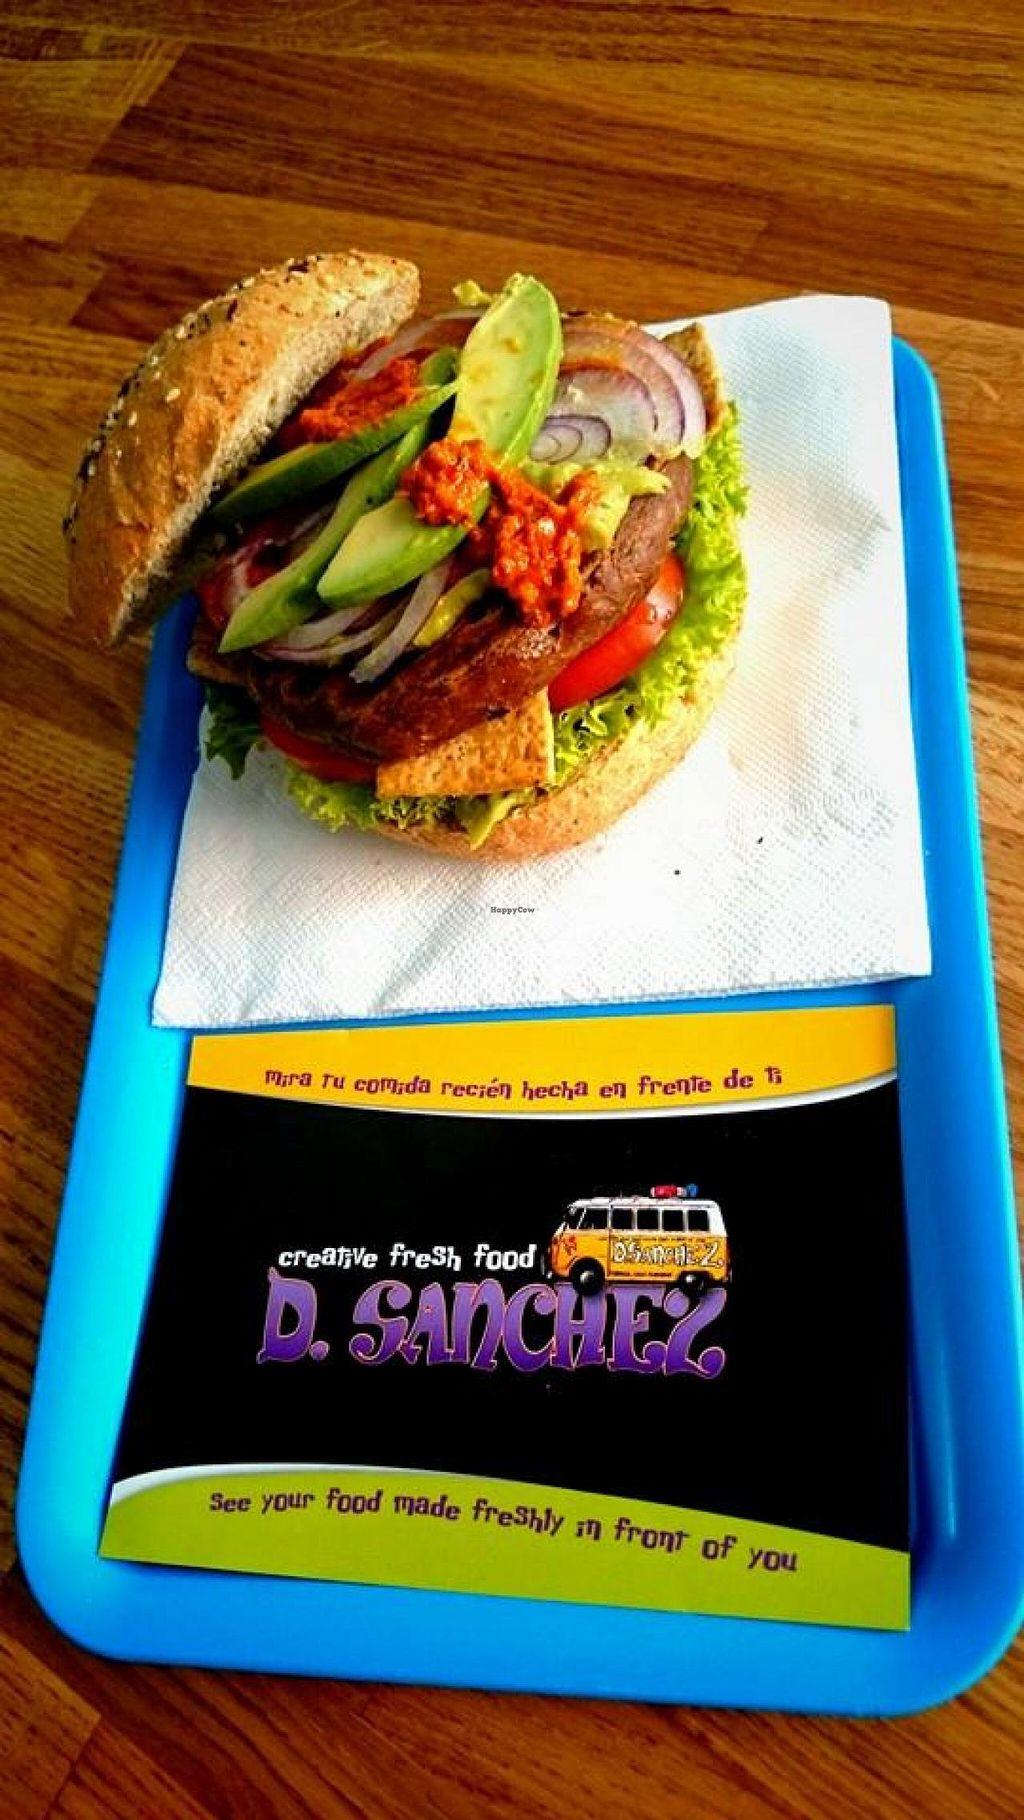 "Photo of D.Sanchez Fresh Food  by <a href=""/members/profile/D.Sanchez%20VPower"">D.Sanchez VPower</a> <br/>VEGAN BURGER, QUINOA BURGER, AVOCADO, HOT SANCHEZ SALSA xXx, LETTUCE, TOFU, TOMATE, FRESH RED ONION!  <br/> July 8, 2015  - <a href='/contact/abuse/image/60375/108630'>Report</a>"